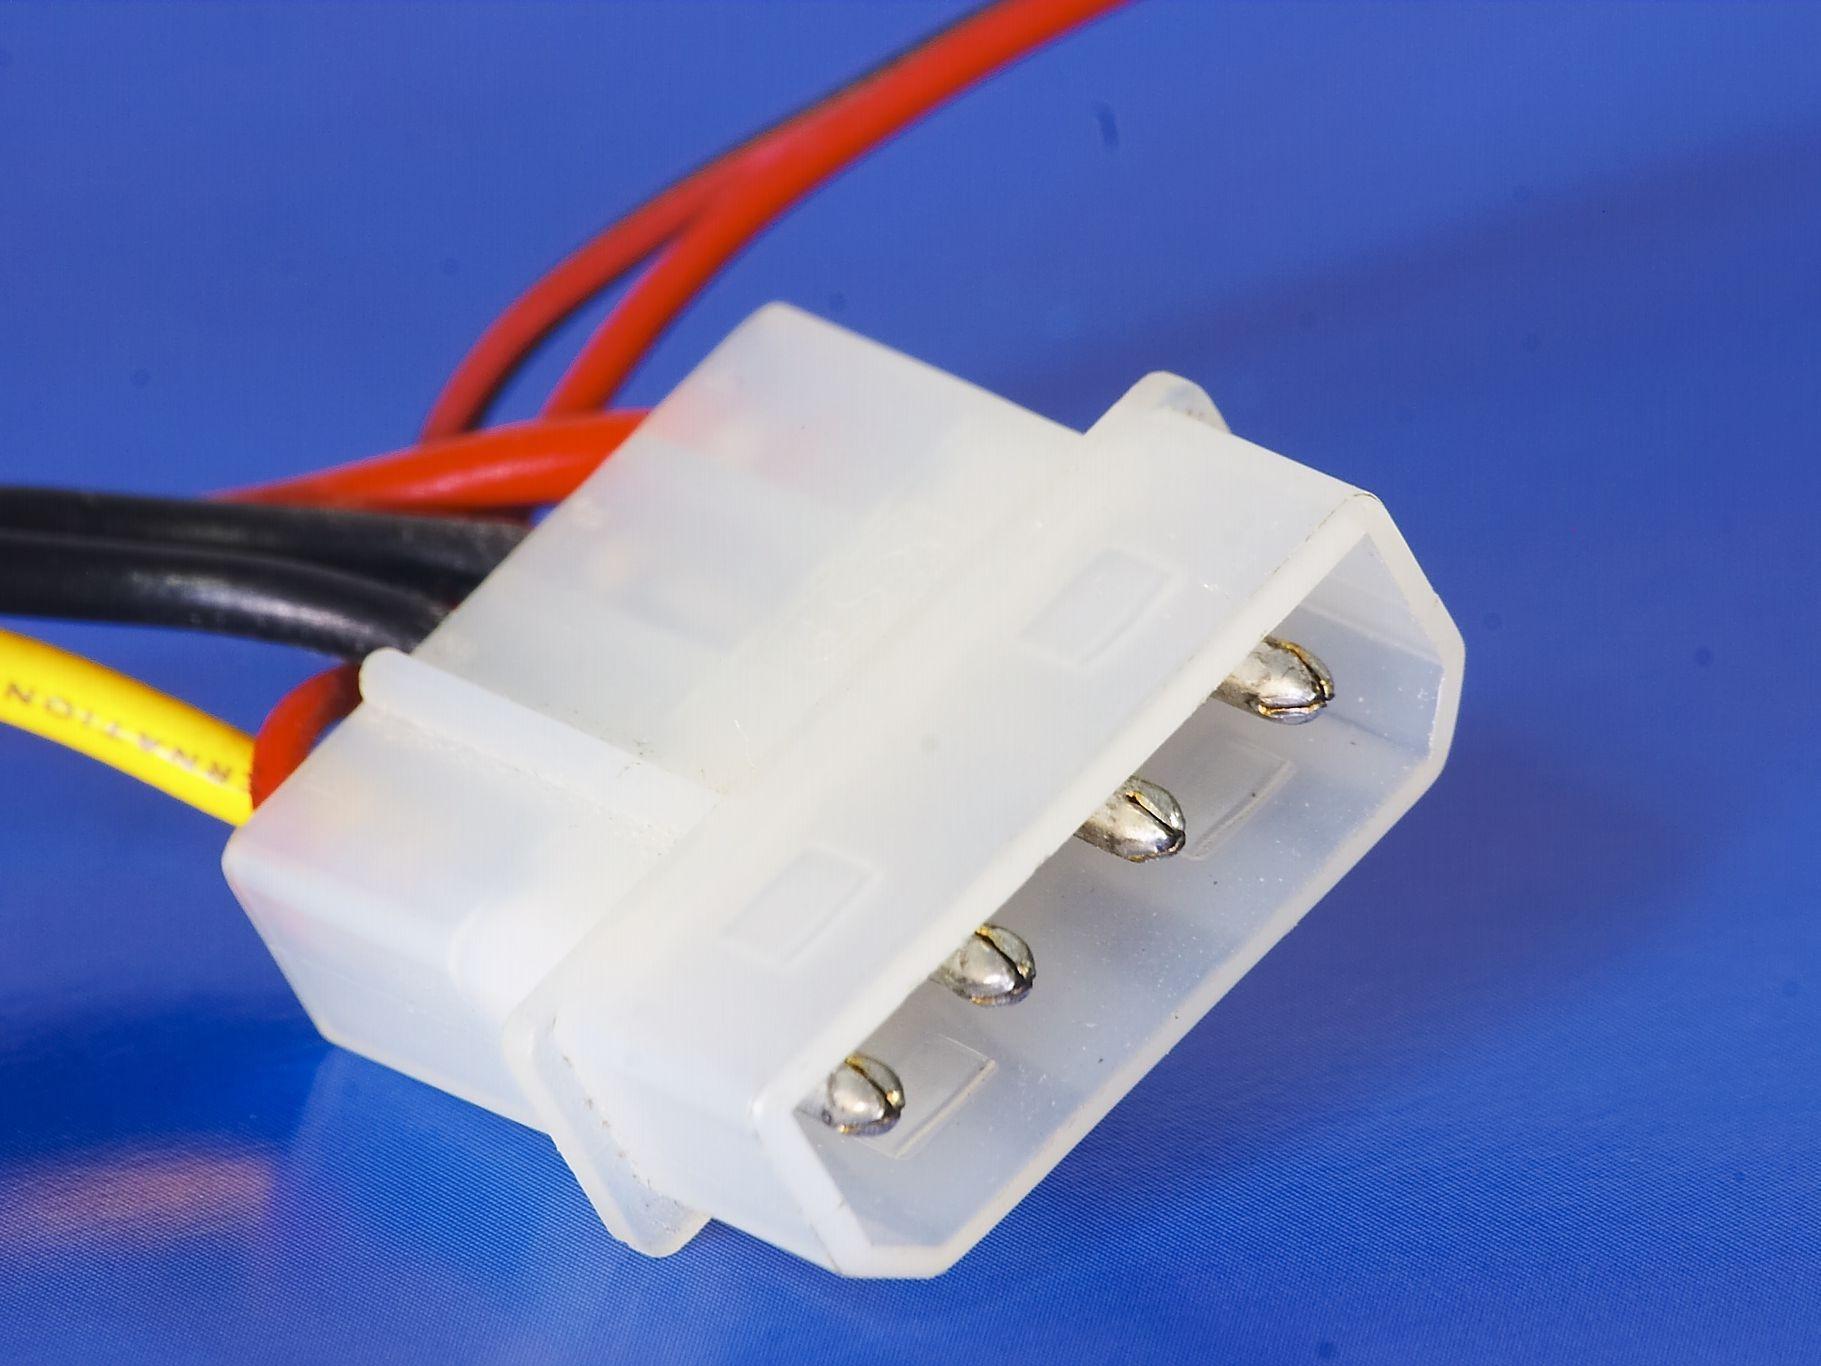 Molex 4 pin Peripheral Power Connector Pinout